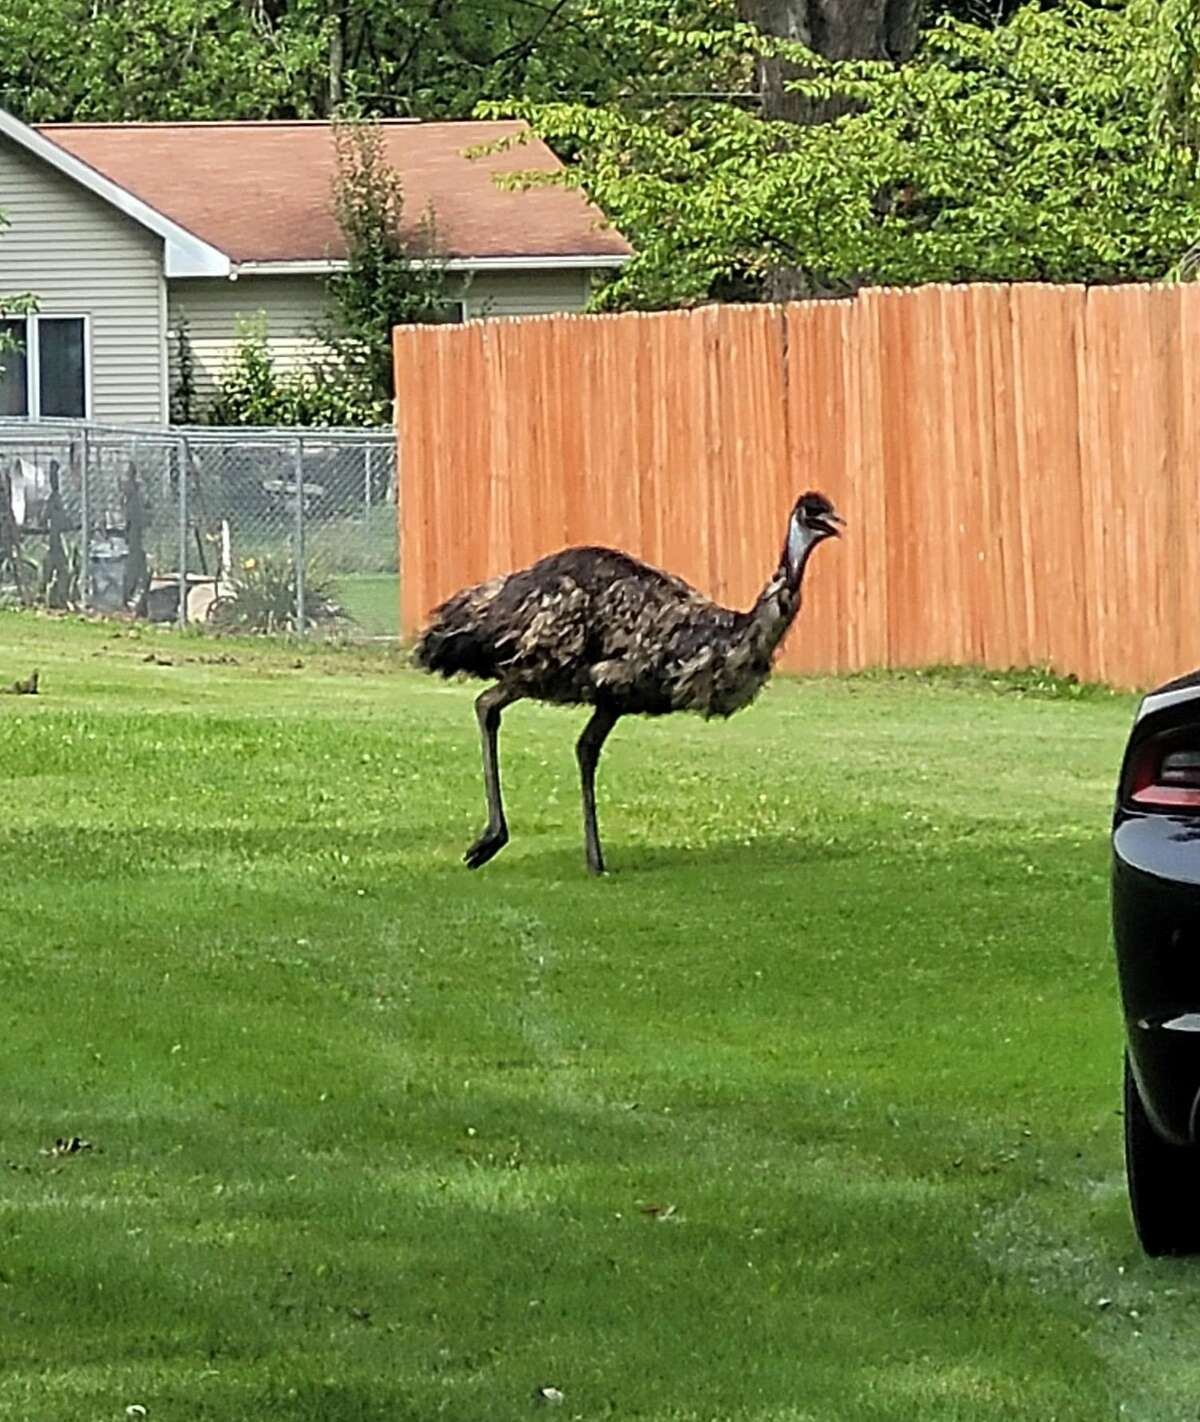 An emu runs loose through Isabella County on Tuesday, Aug. 31, 2021.